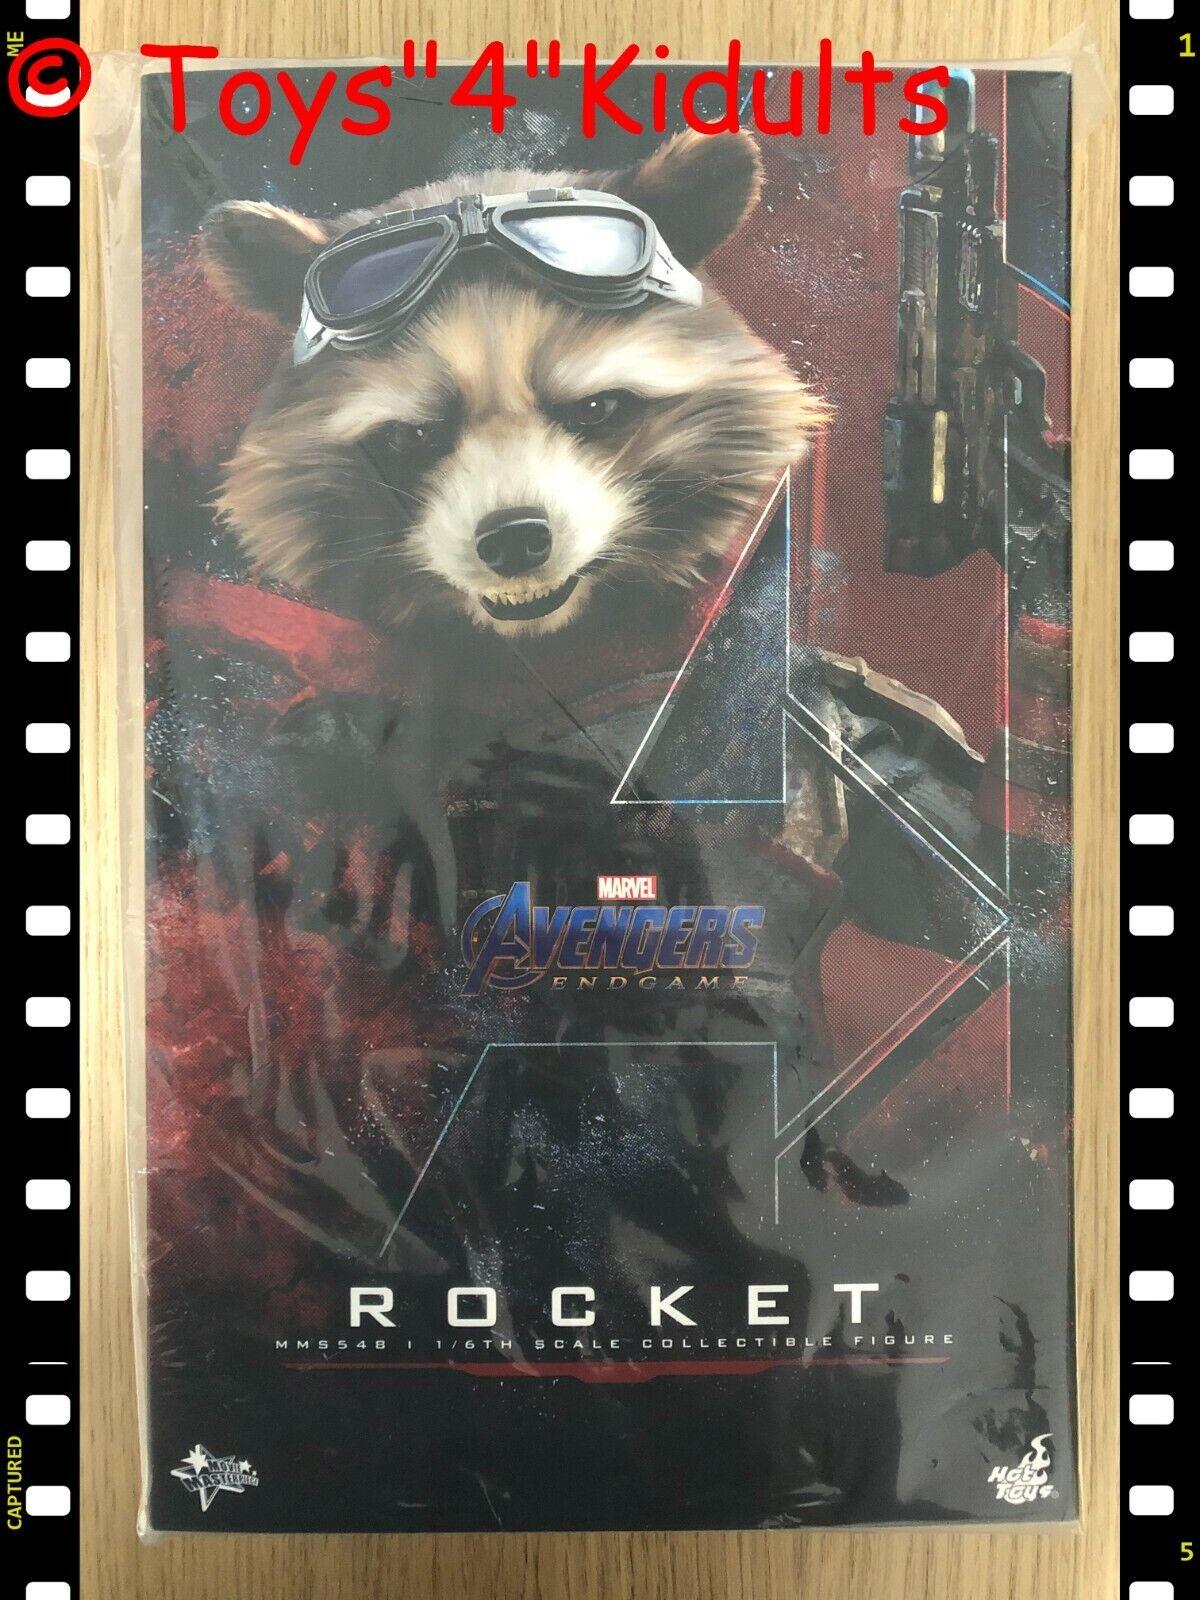 🔥 Hot Toys MMS 548 Avengers Endgame Rocket 1/6 12 inch Action Figure NEW on eBay thumbnail